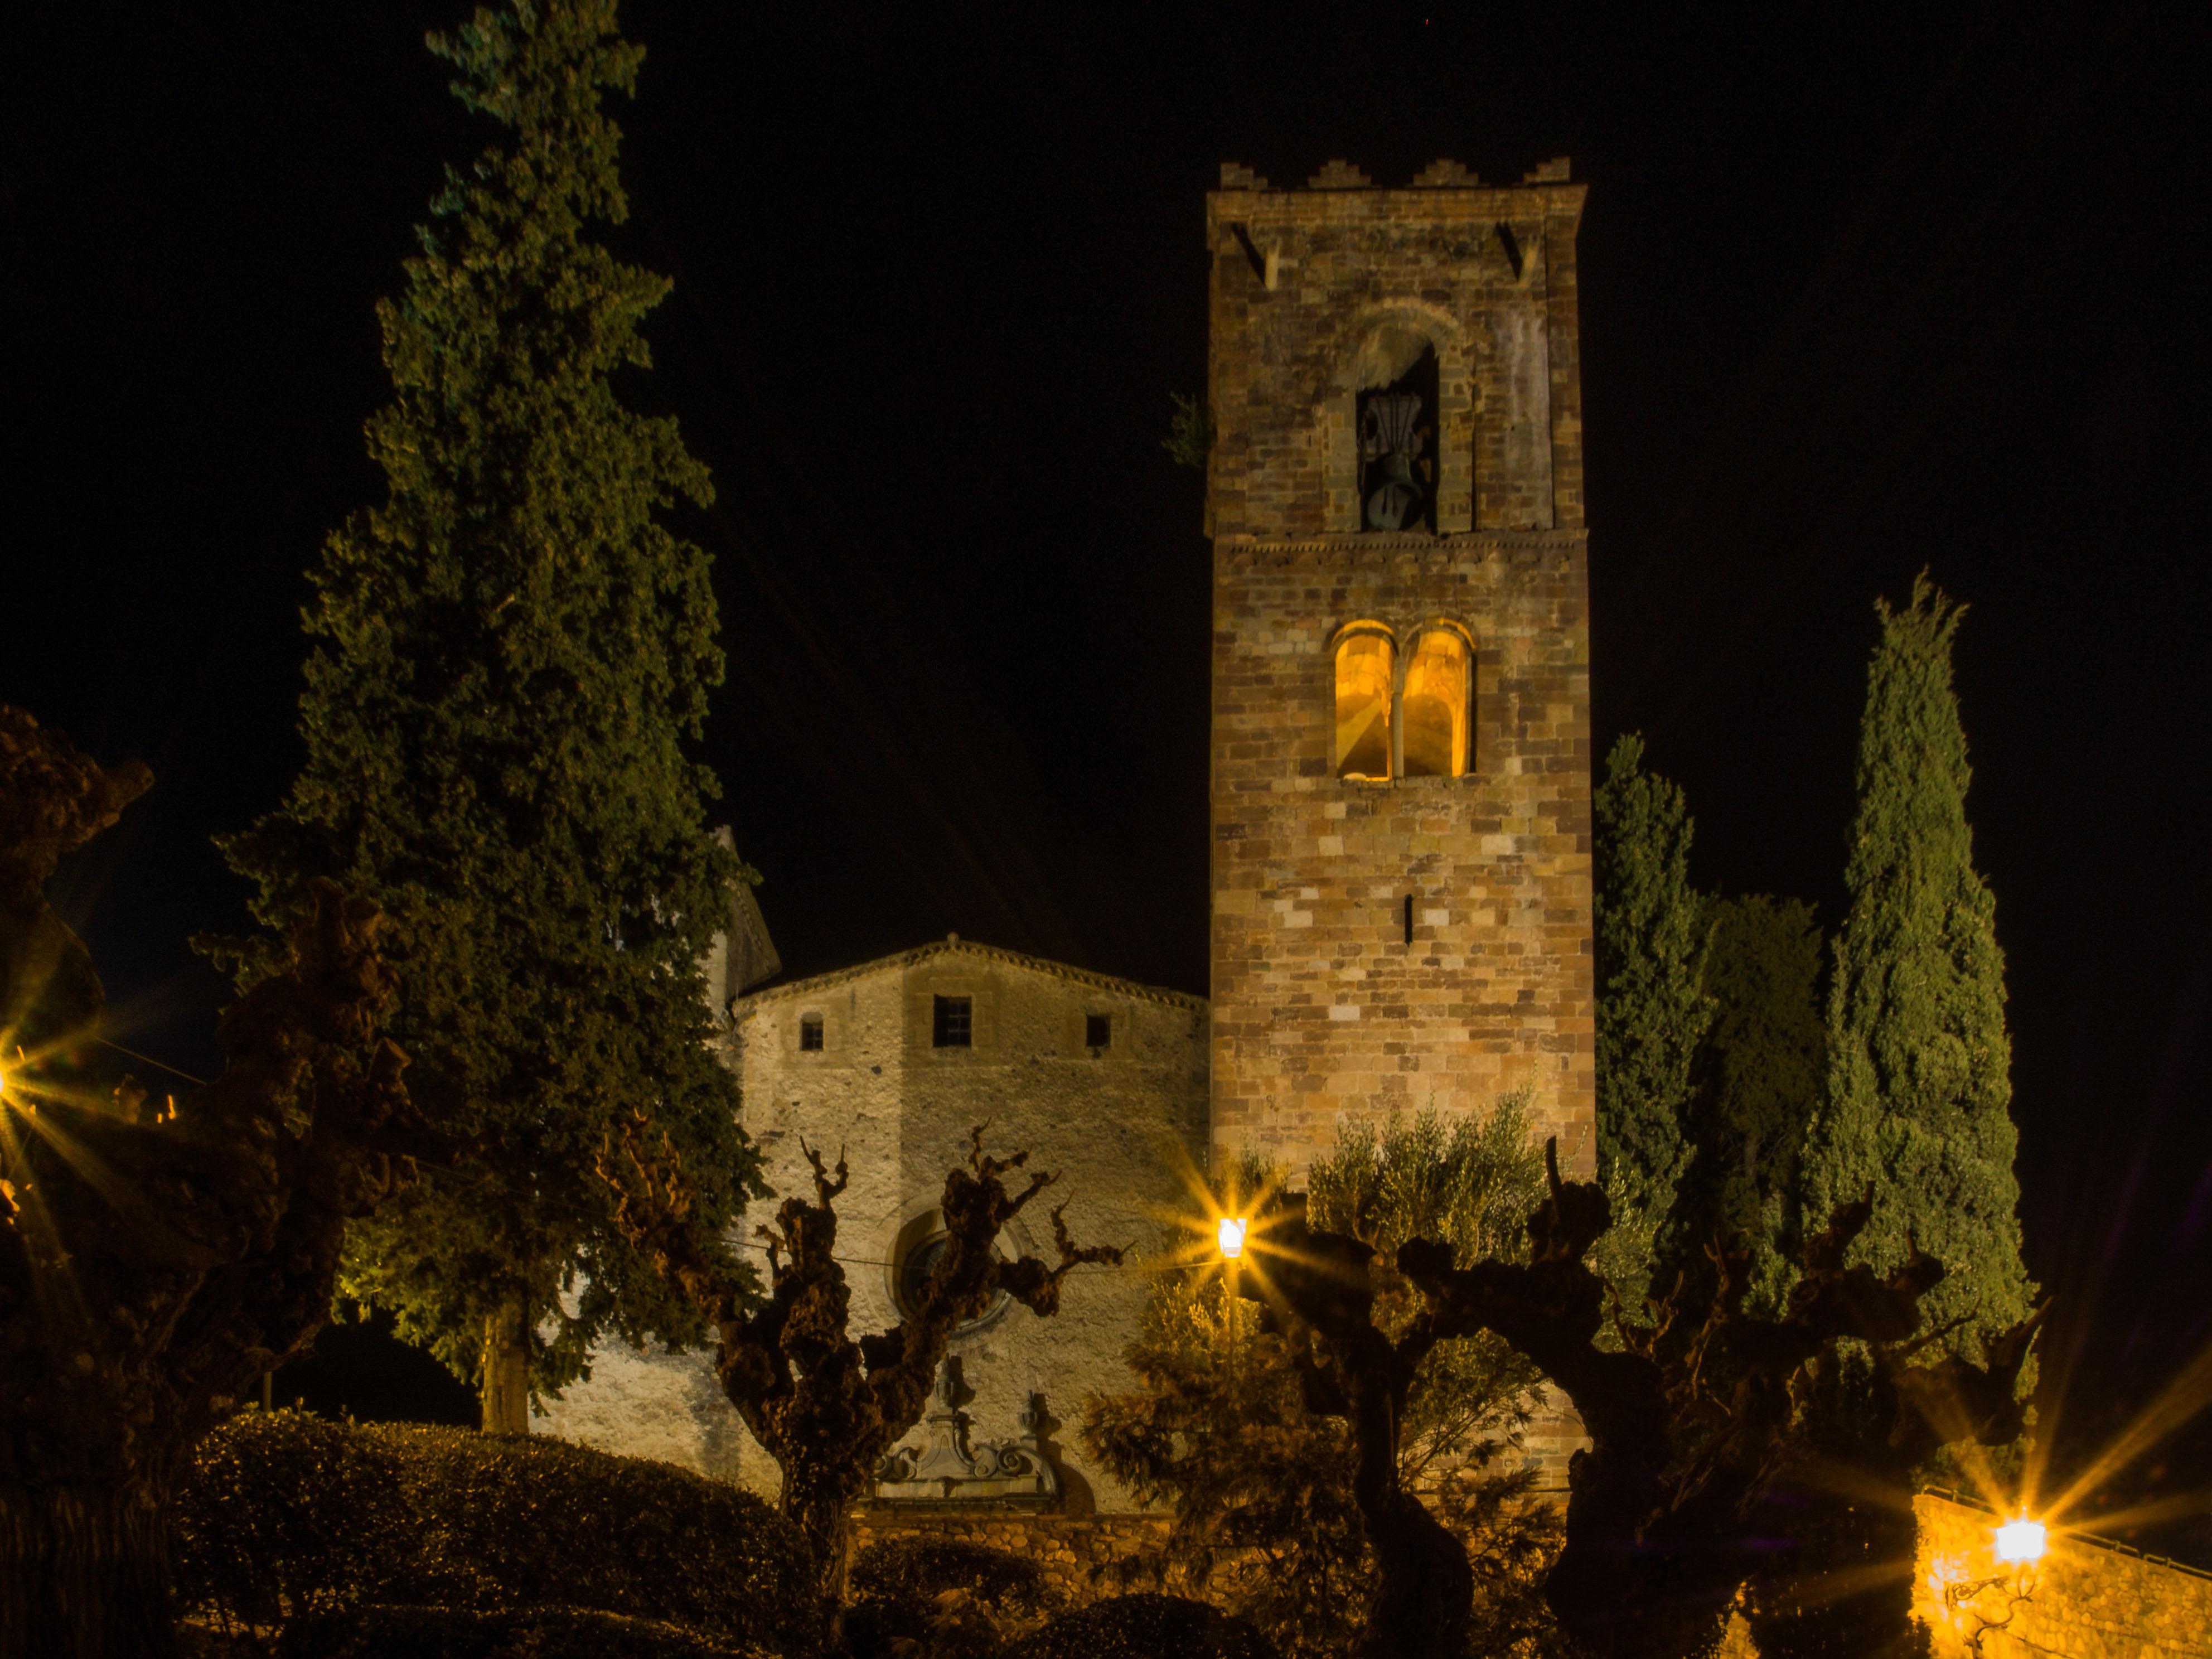 Esglesia Sant Pere Vilamajor (Nocturn)